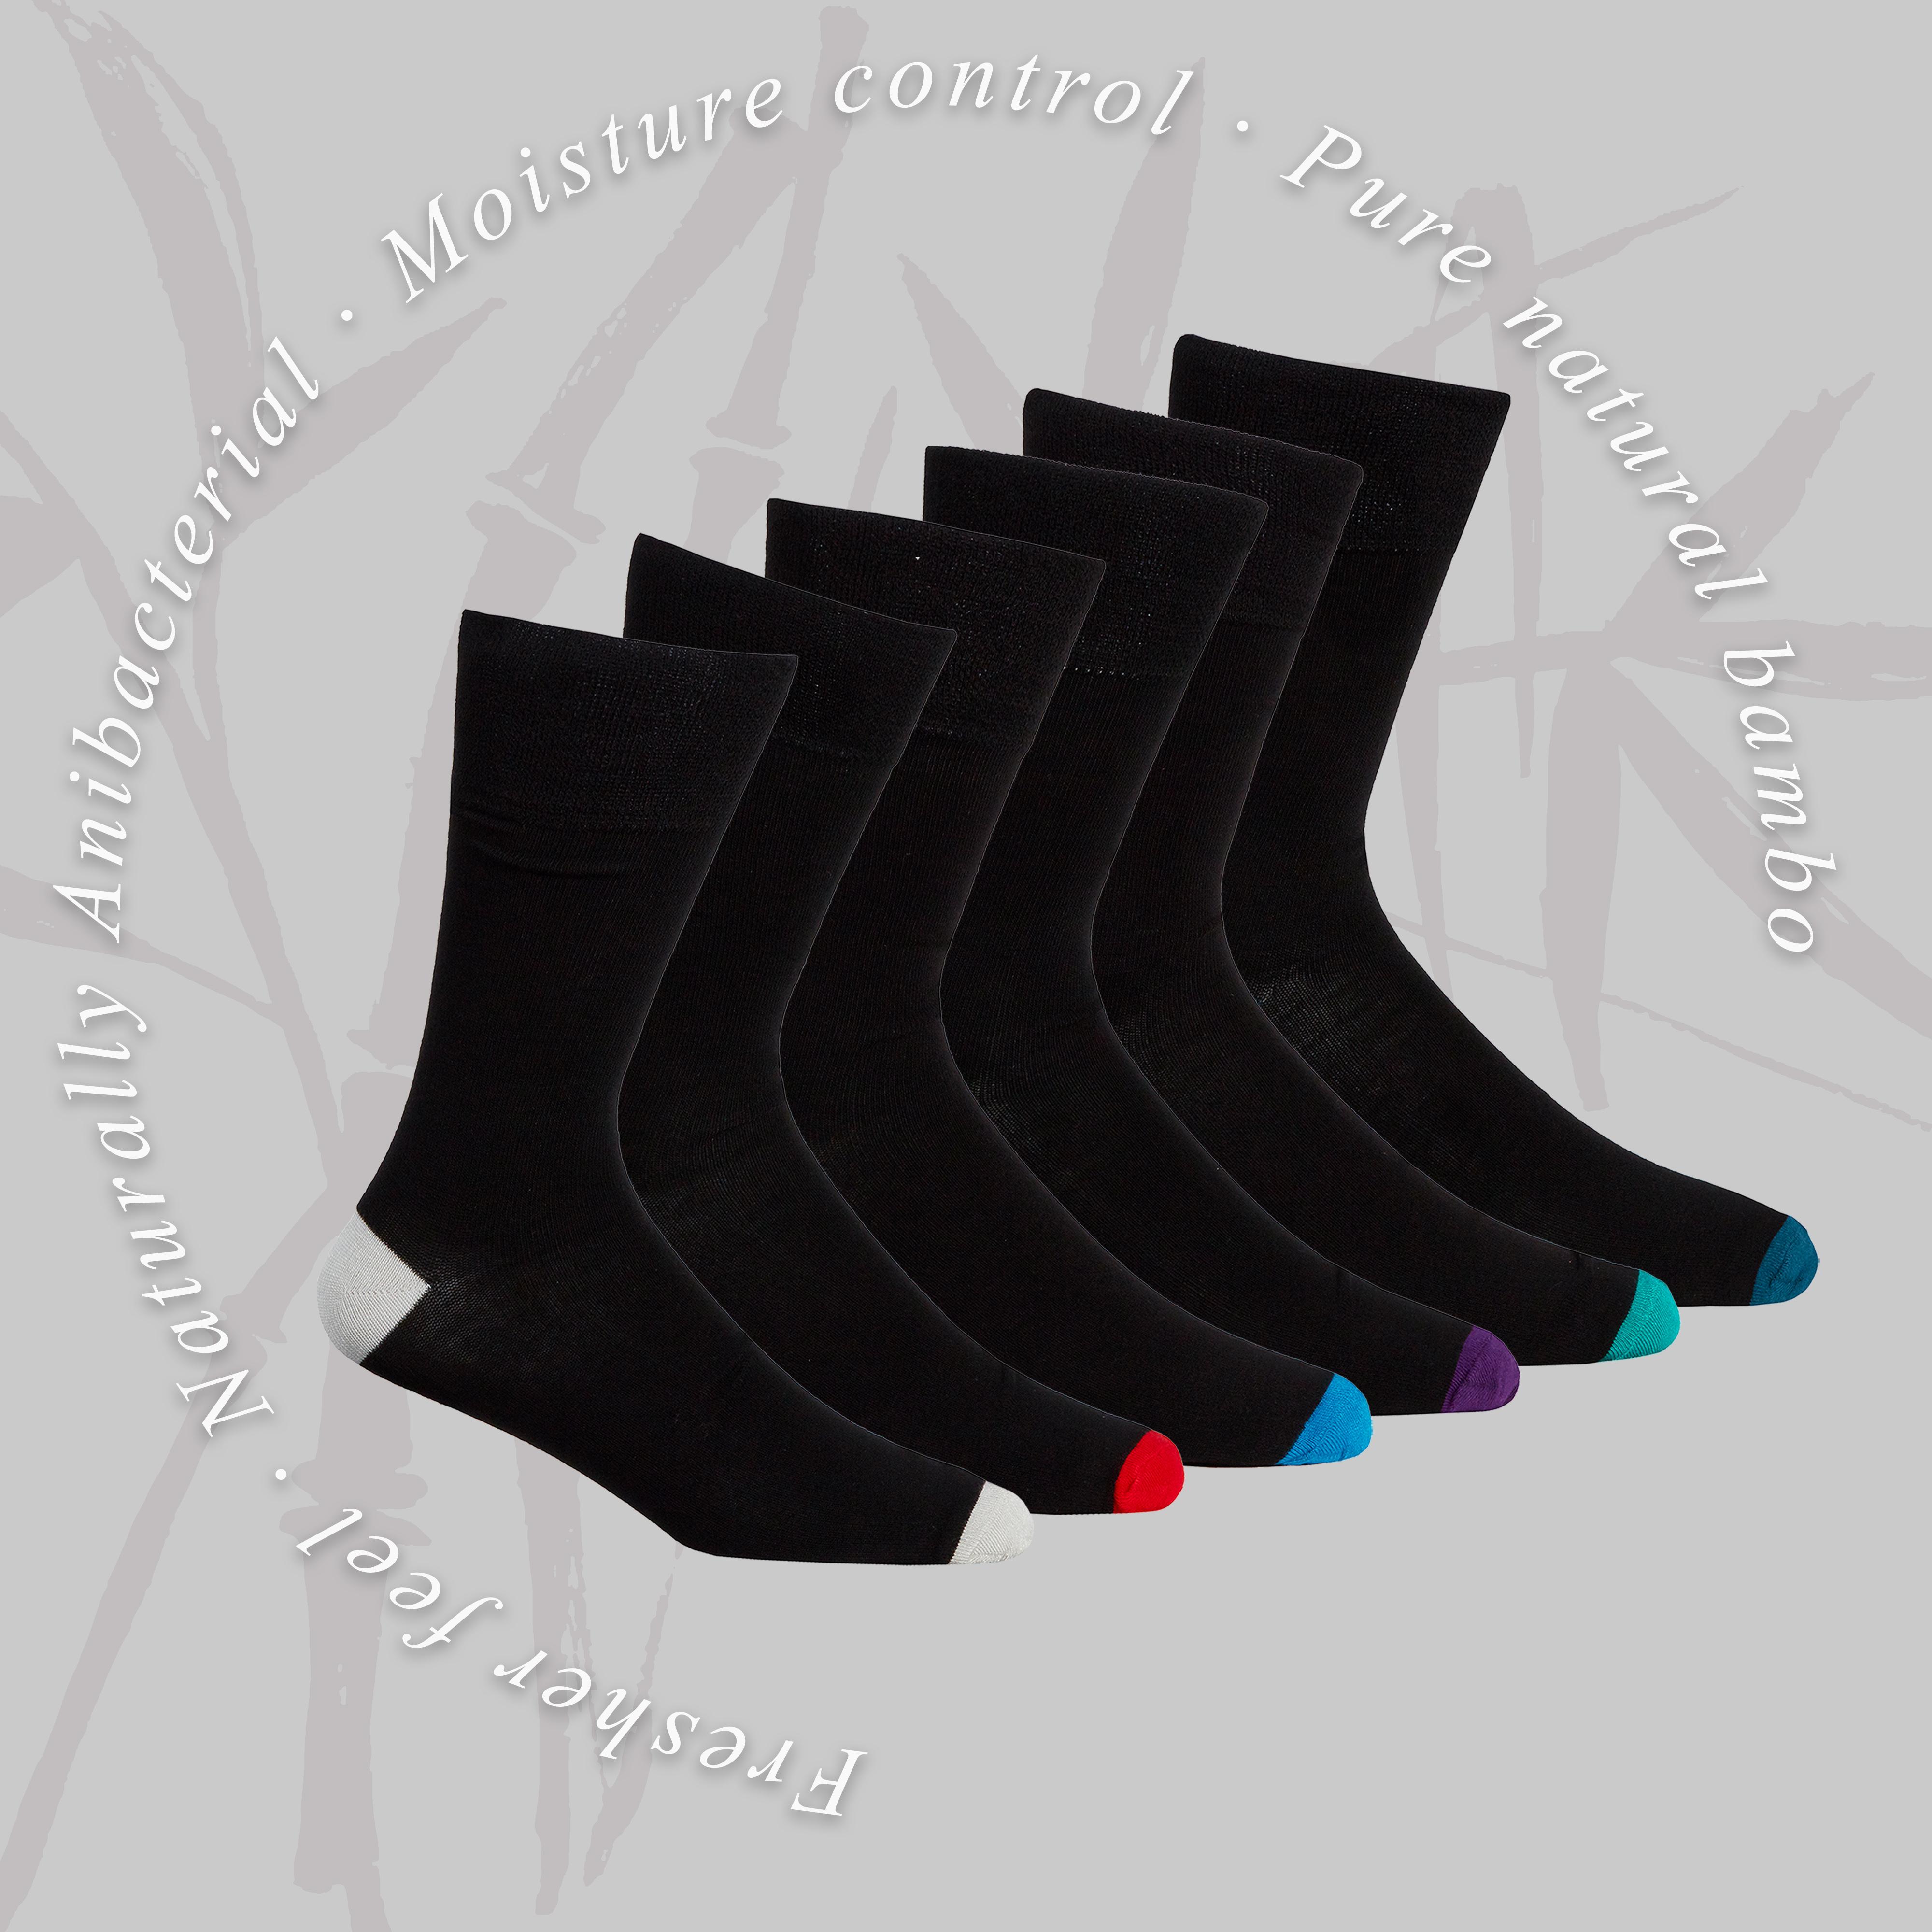 Mens 3 6 Pairs Luxury Bamboo Non Elastic Diabetic Socks Gentle Soft Size 6-11